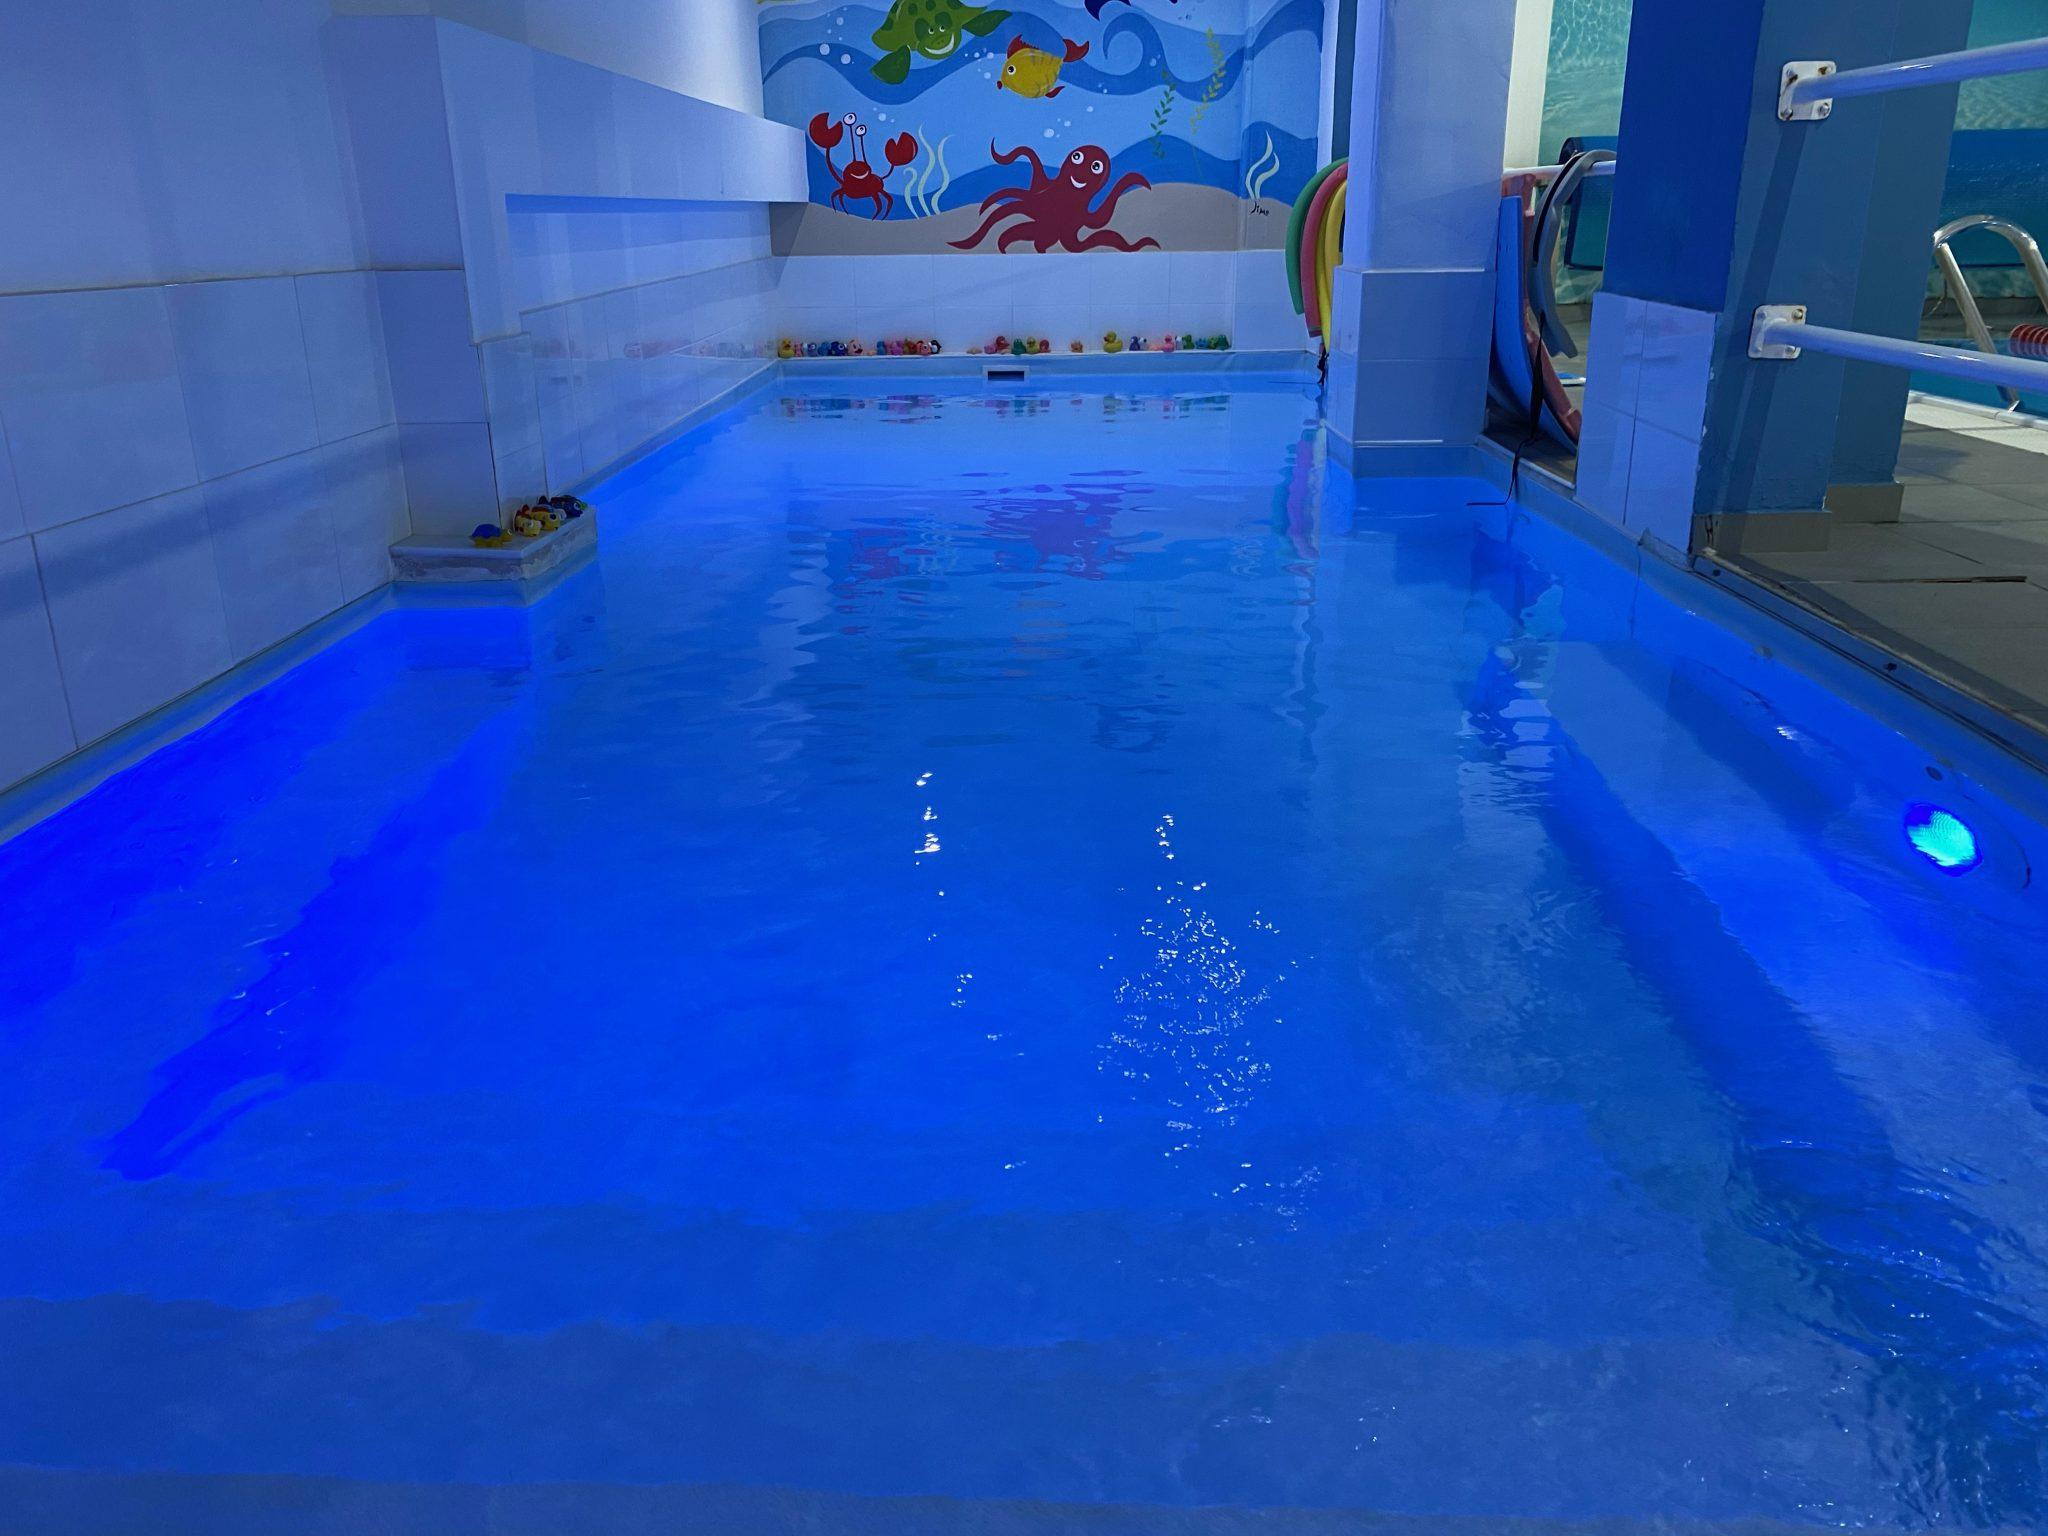 delfis-kolymvhthrio-agios-dhmhtrios-9